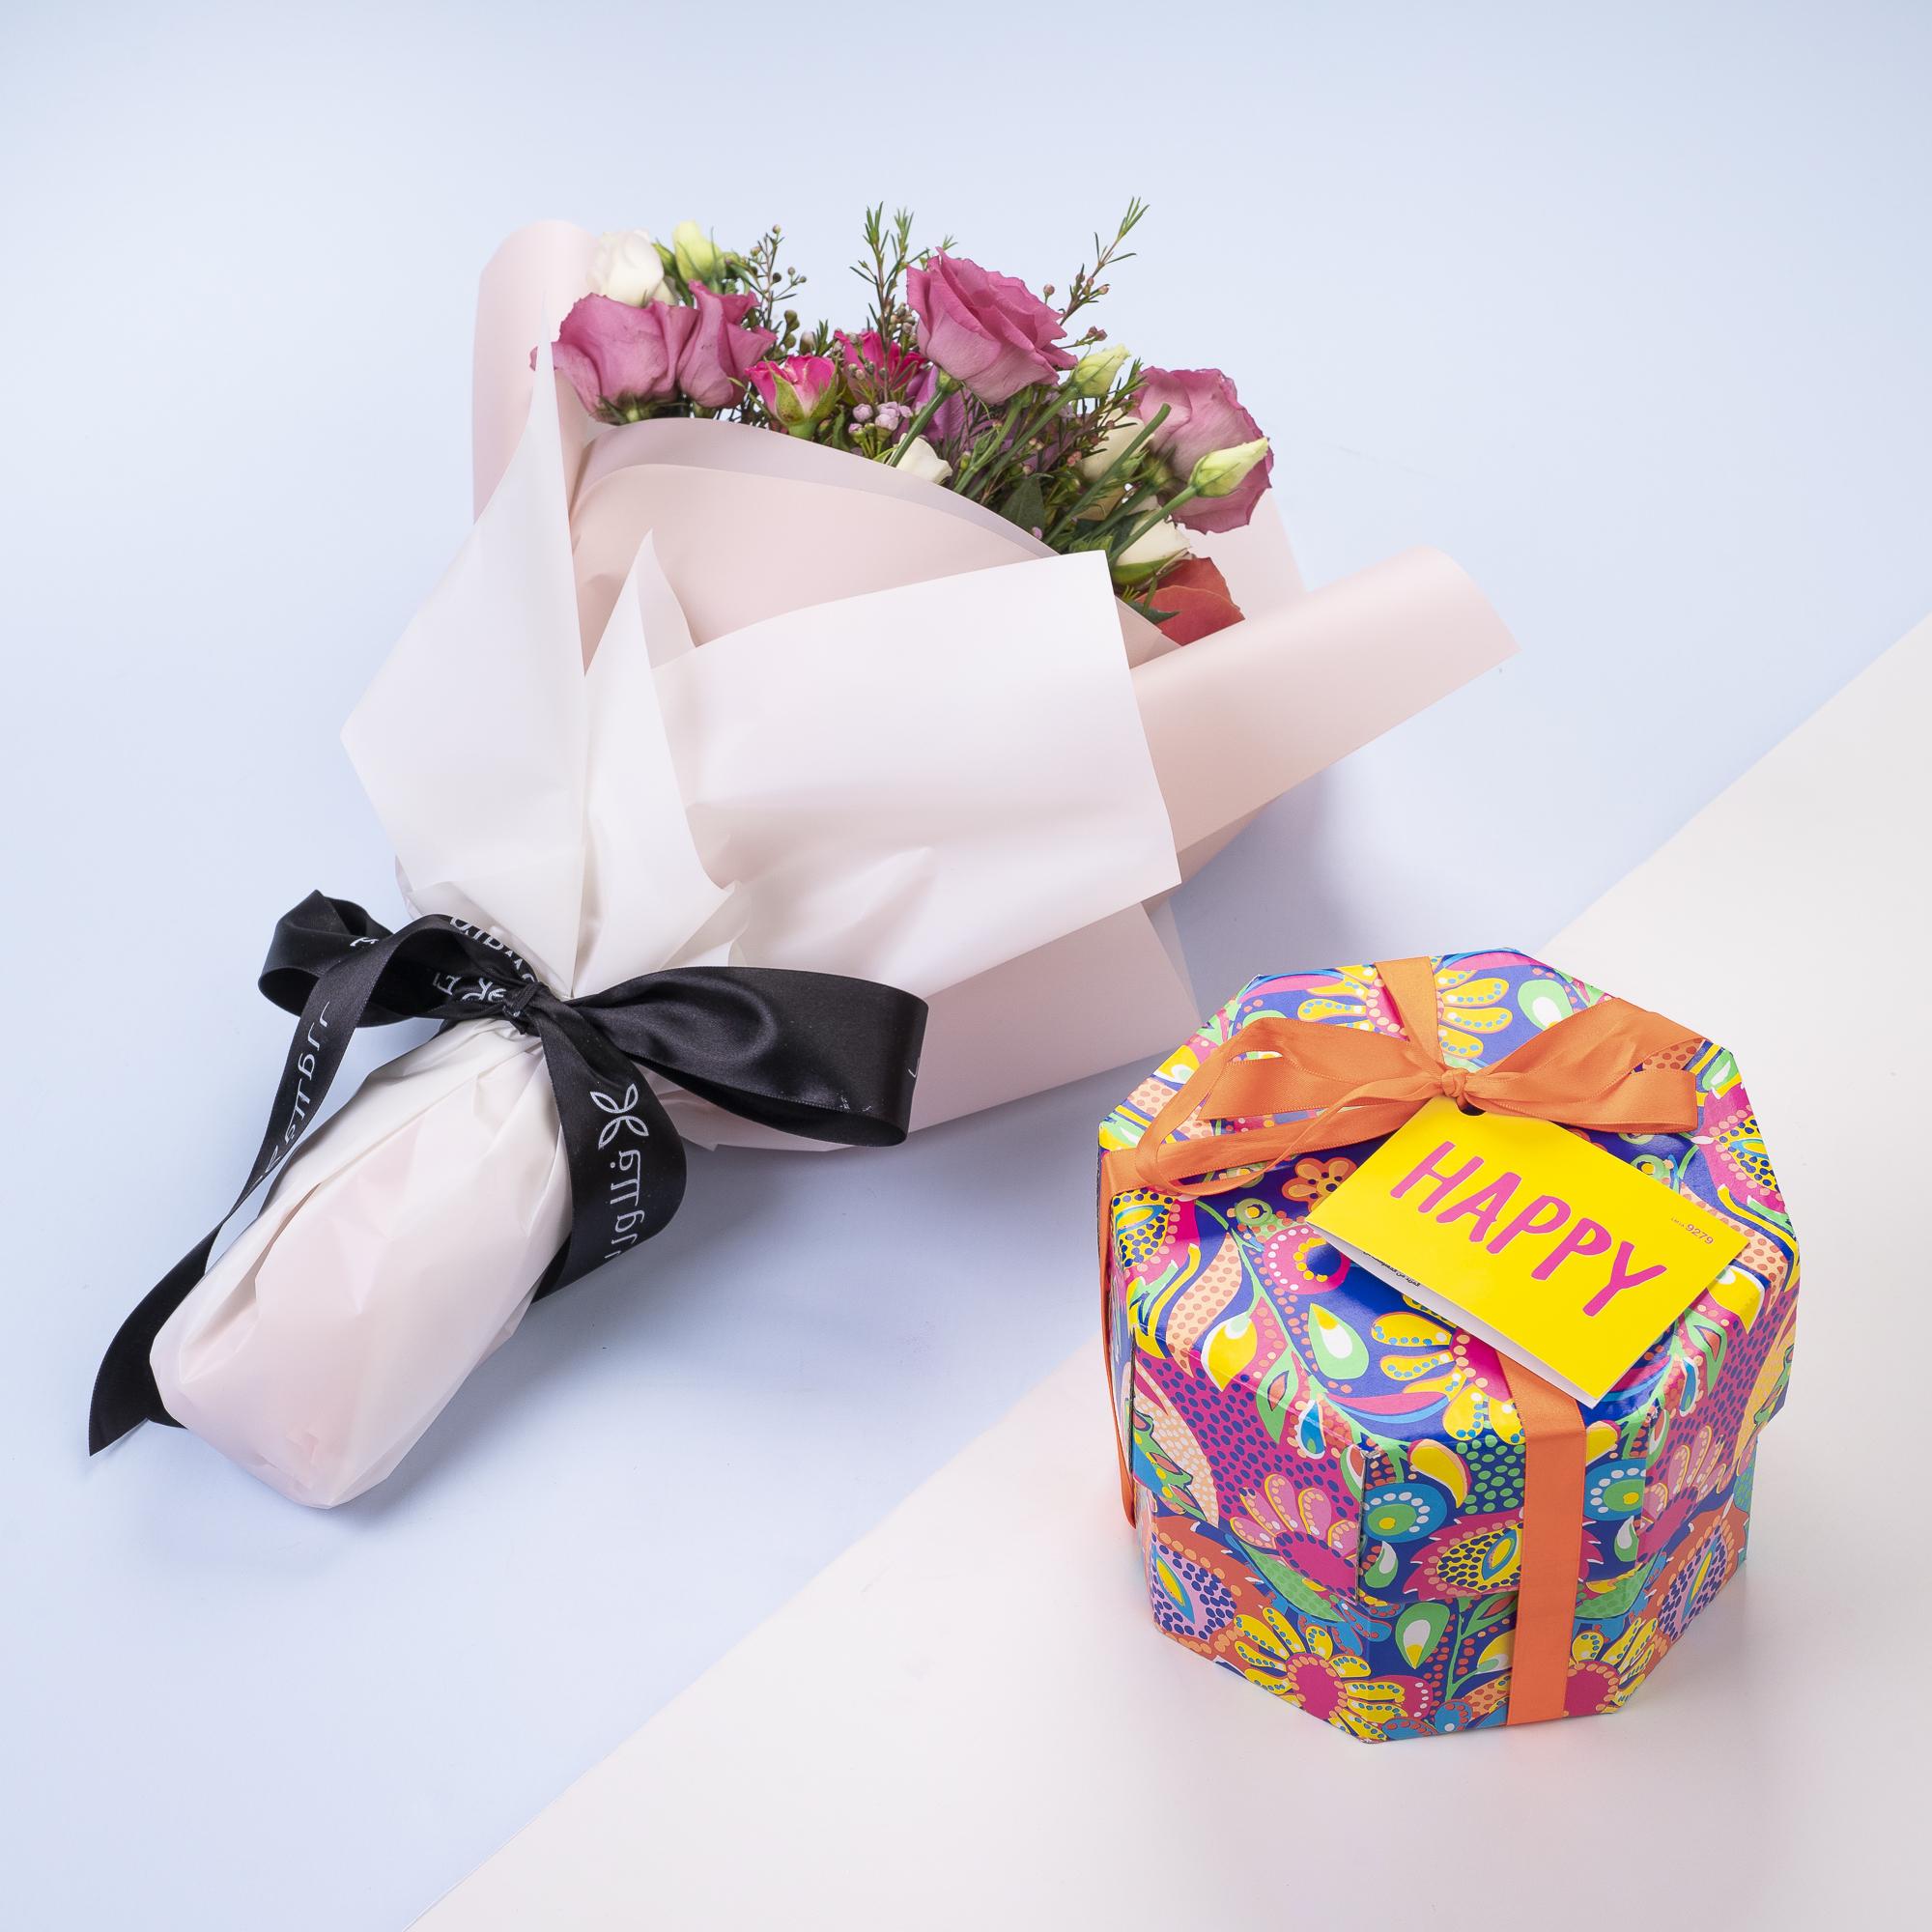 Lush The Happy B+Gift